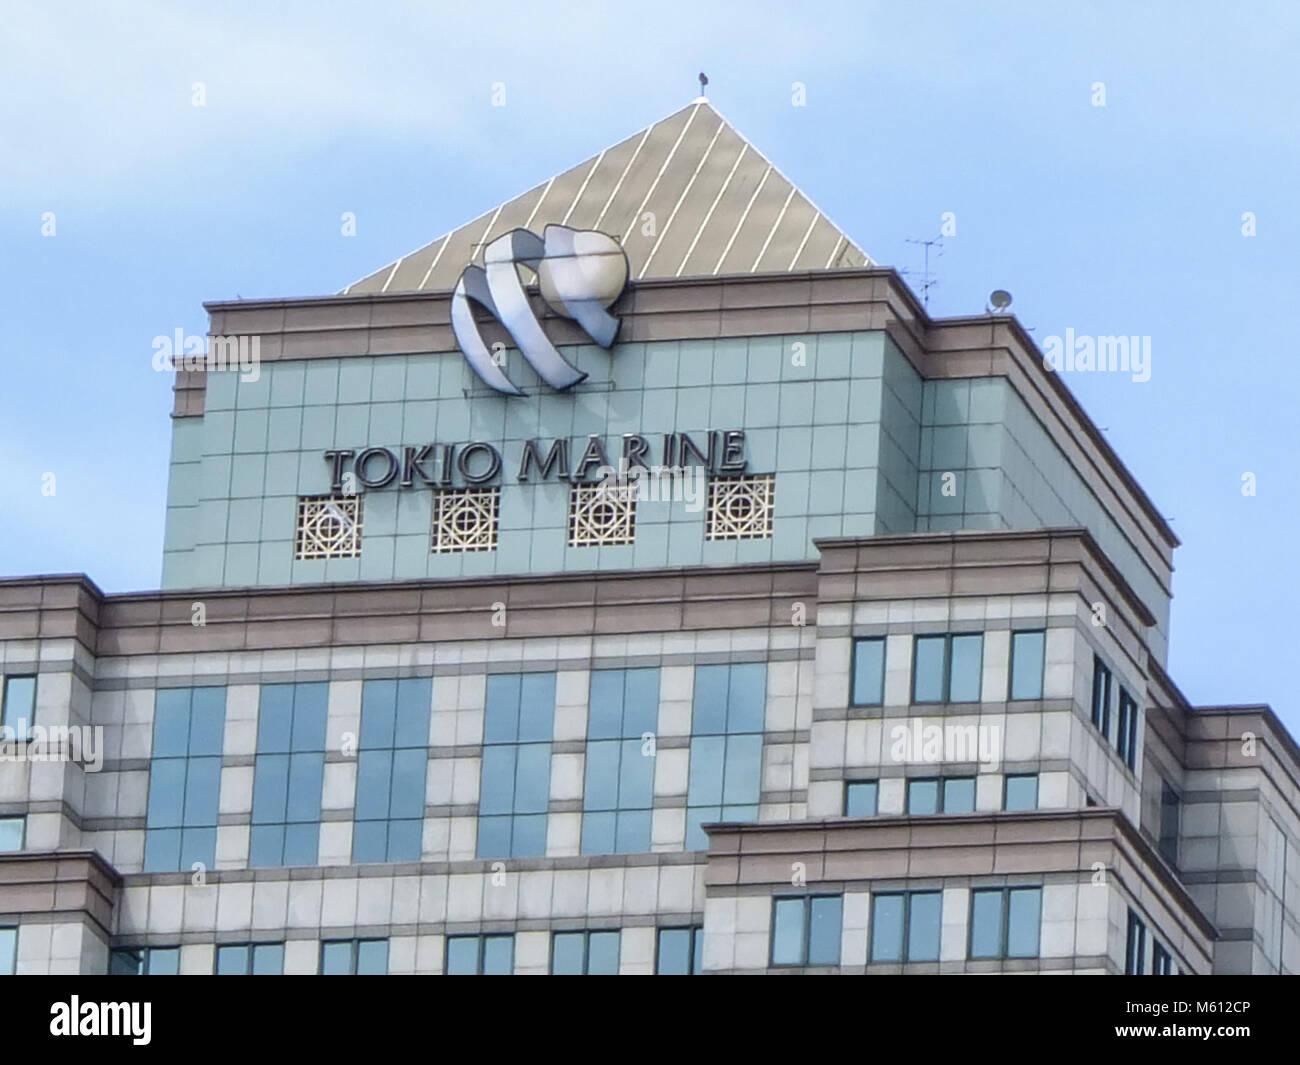 Kuala Lumpur Malaysia 28th Feb 2018 Tokio Marine Building Is Seen Stock Photo Alamy